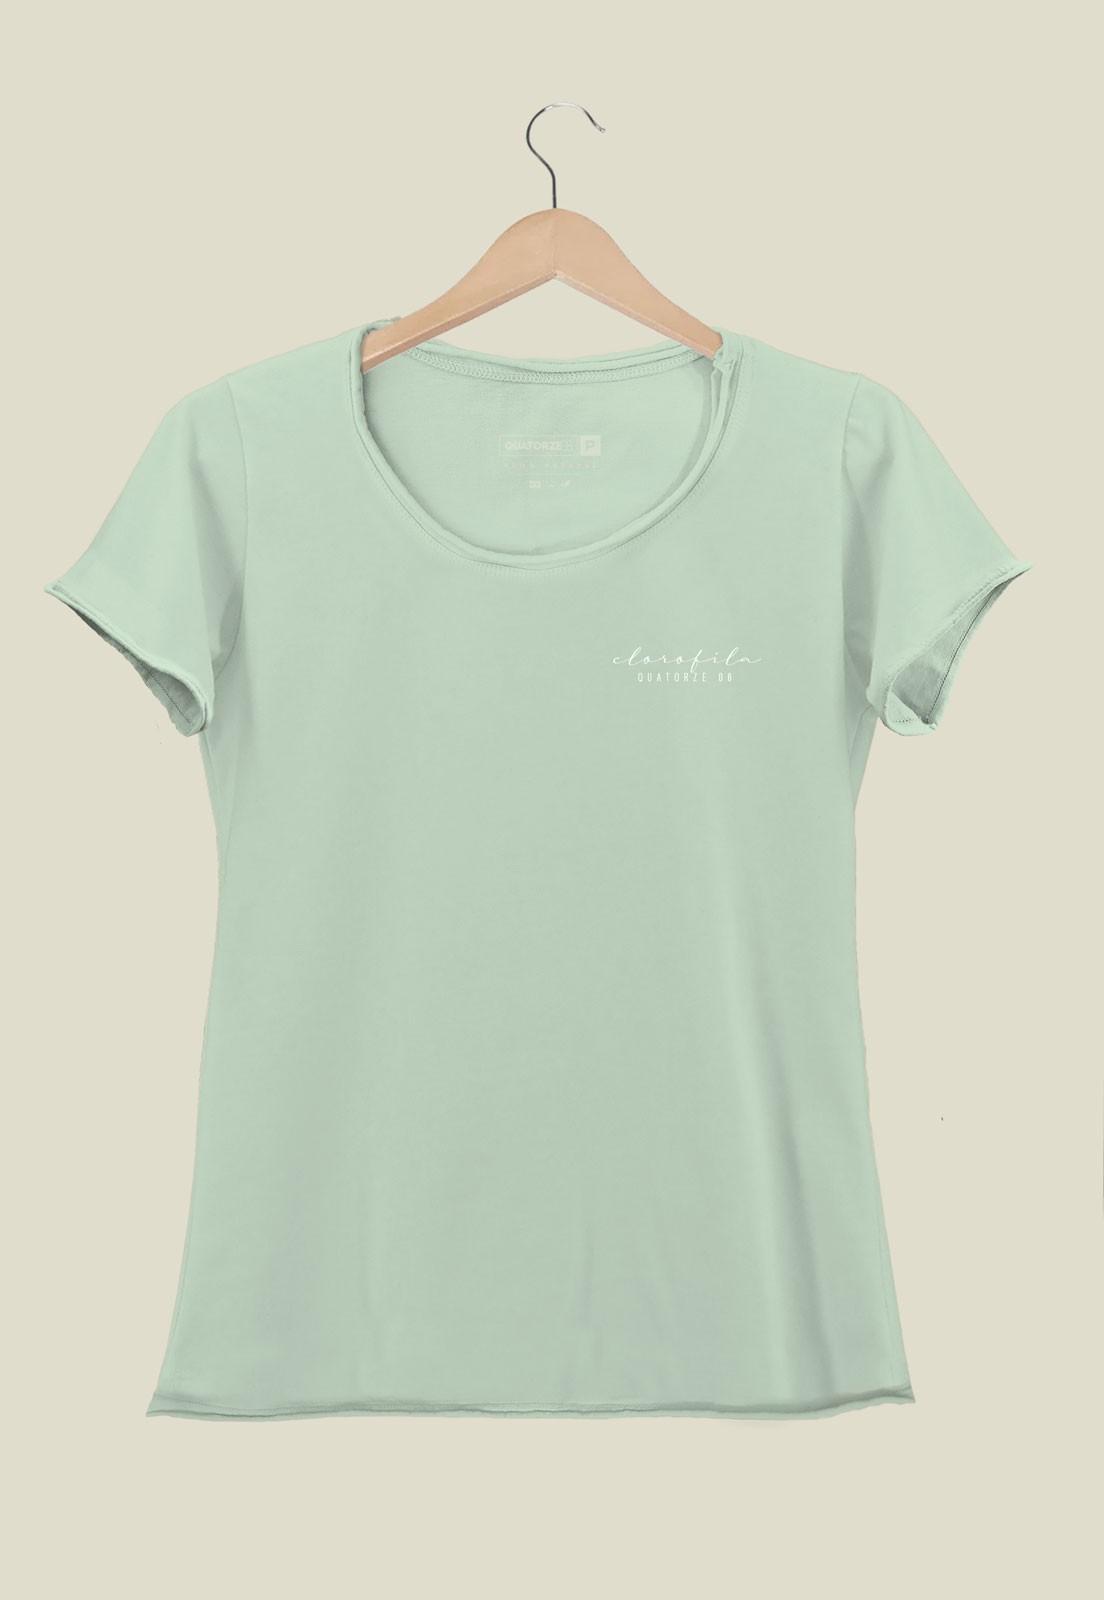 Camiseta Feminina Clorofila Tingimento Natural